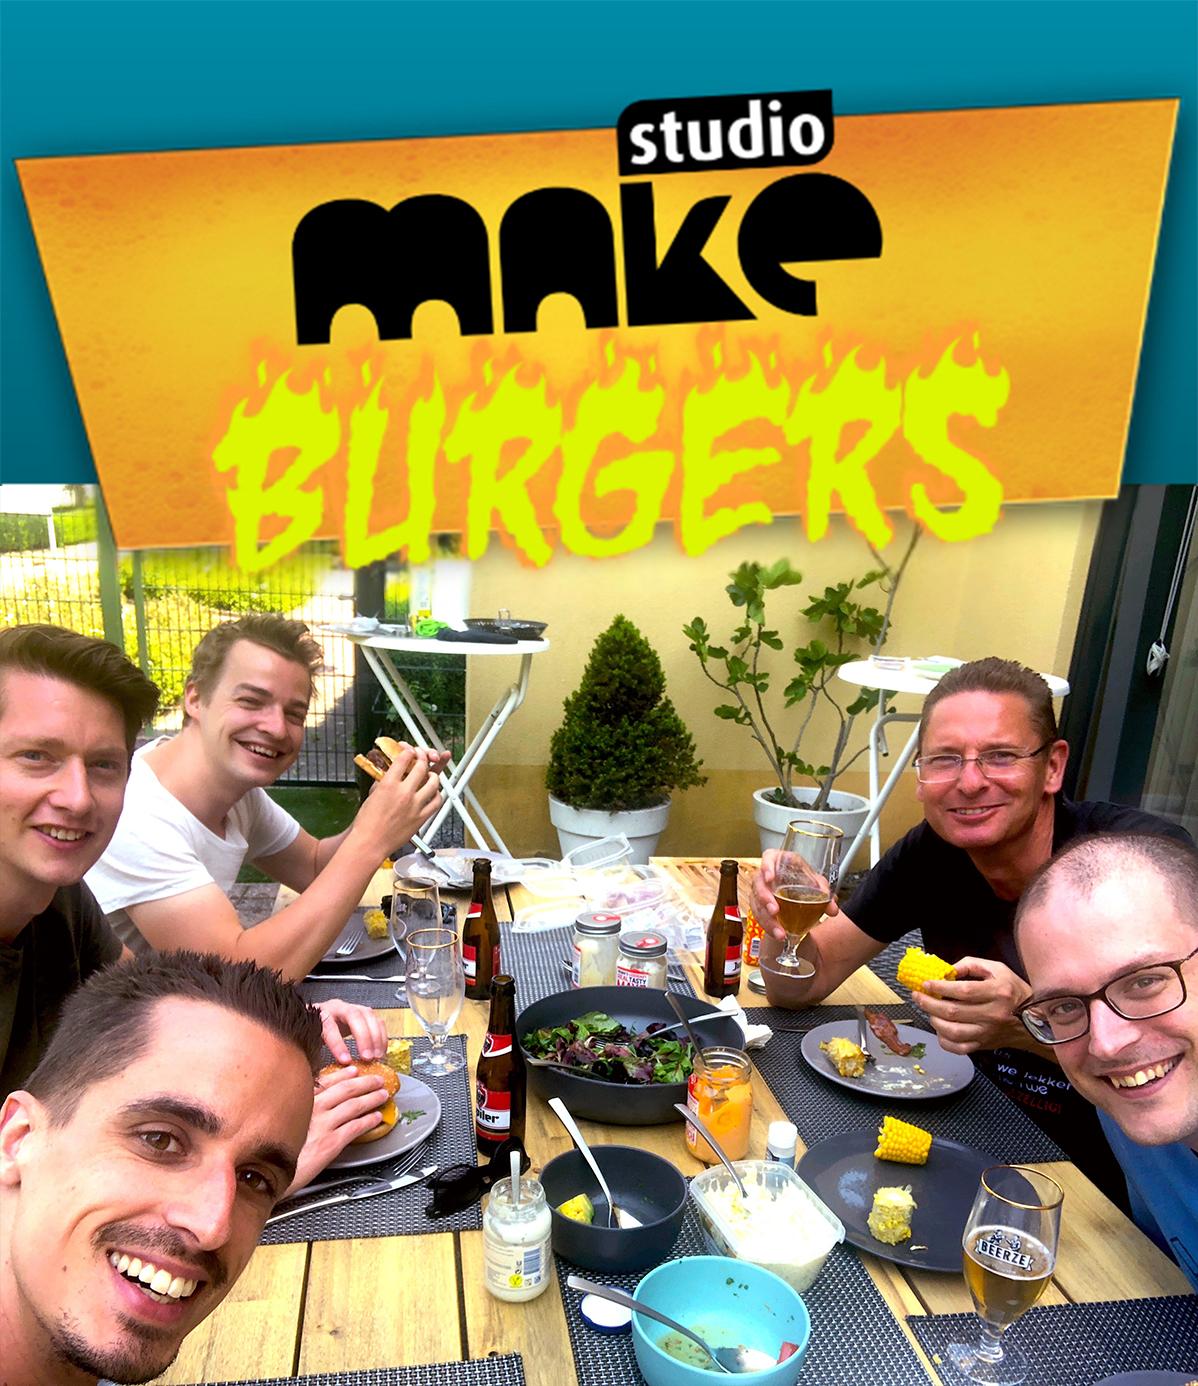 barbeque studio make team